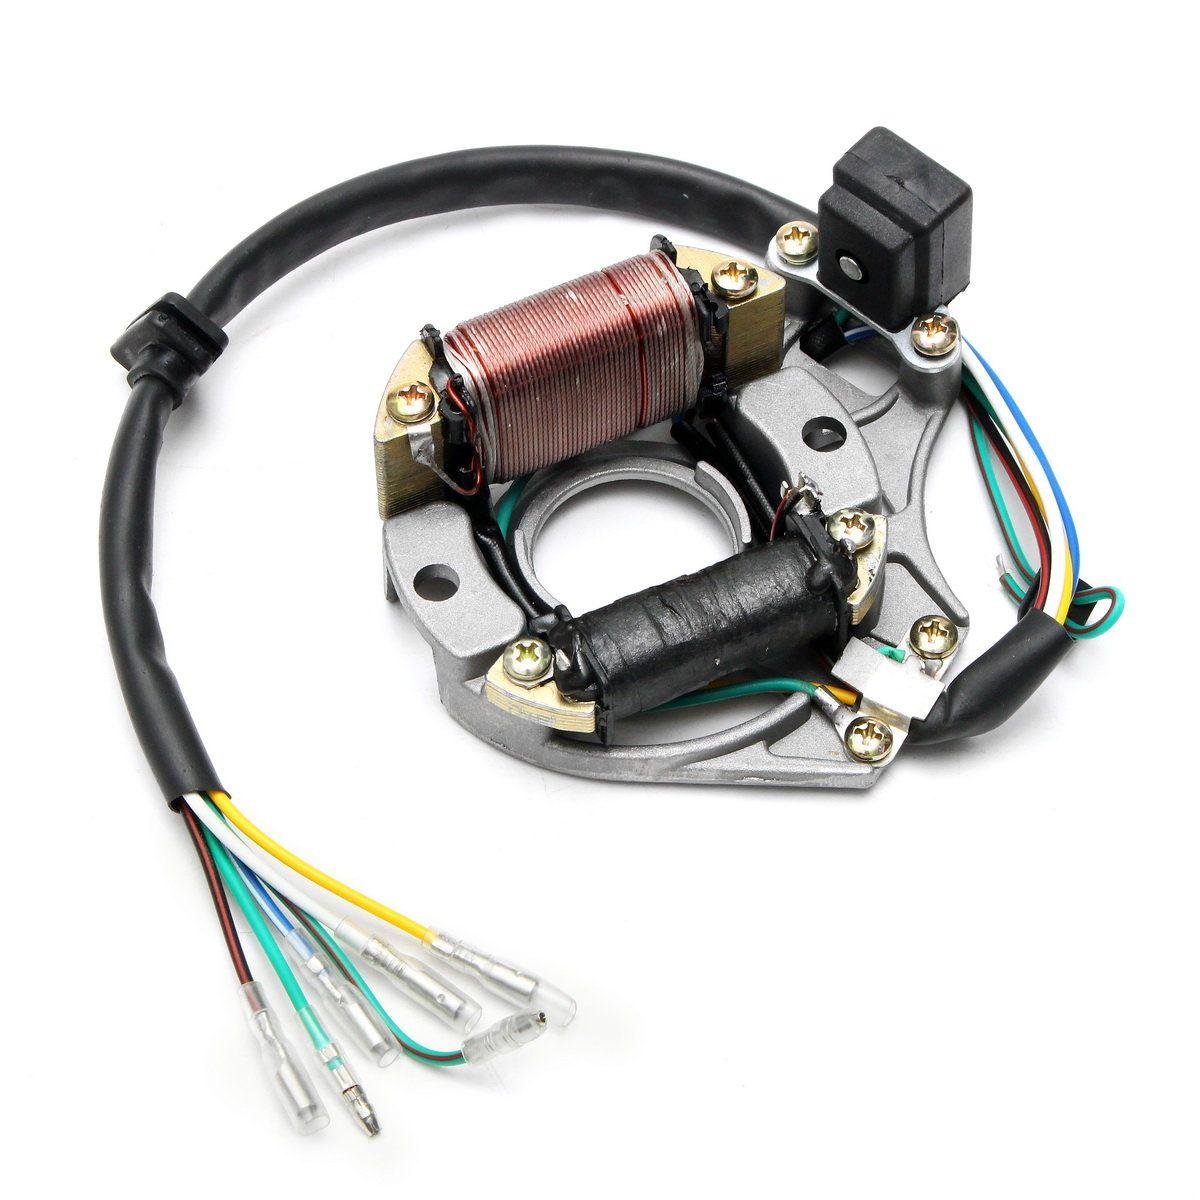 Us1299 Stator Magneto Generator Electric Start For Kazuma Meerkat 50cc Atv Starter Wiring Quad Bike 70cc 90cc